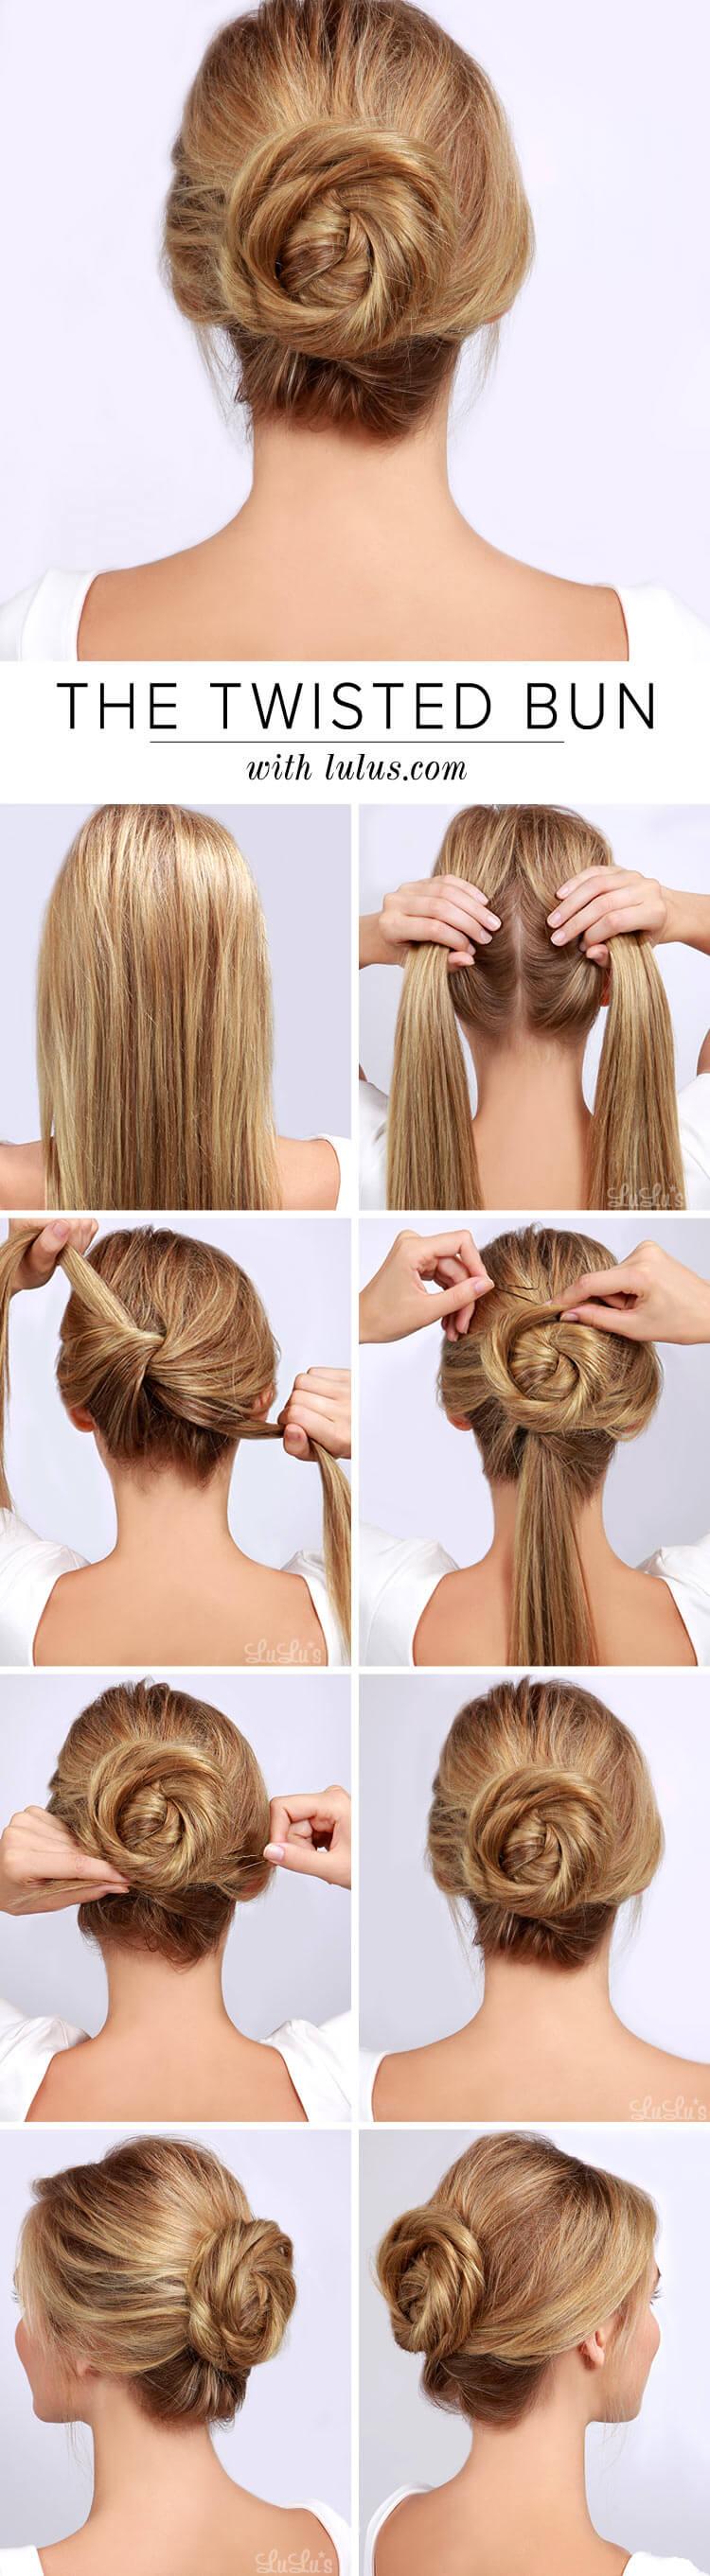 easy twist bun hairstyling